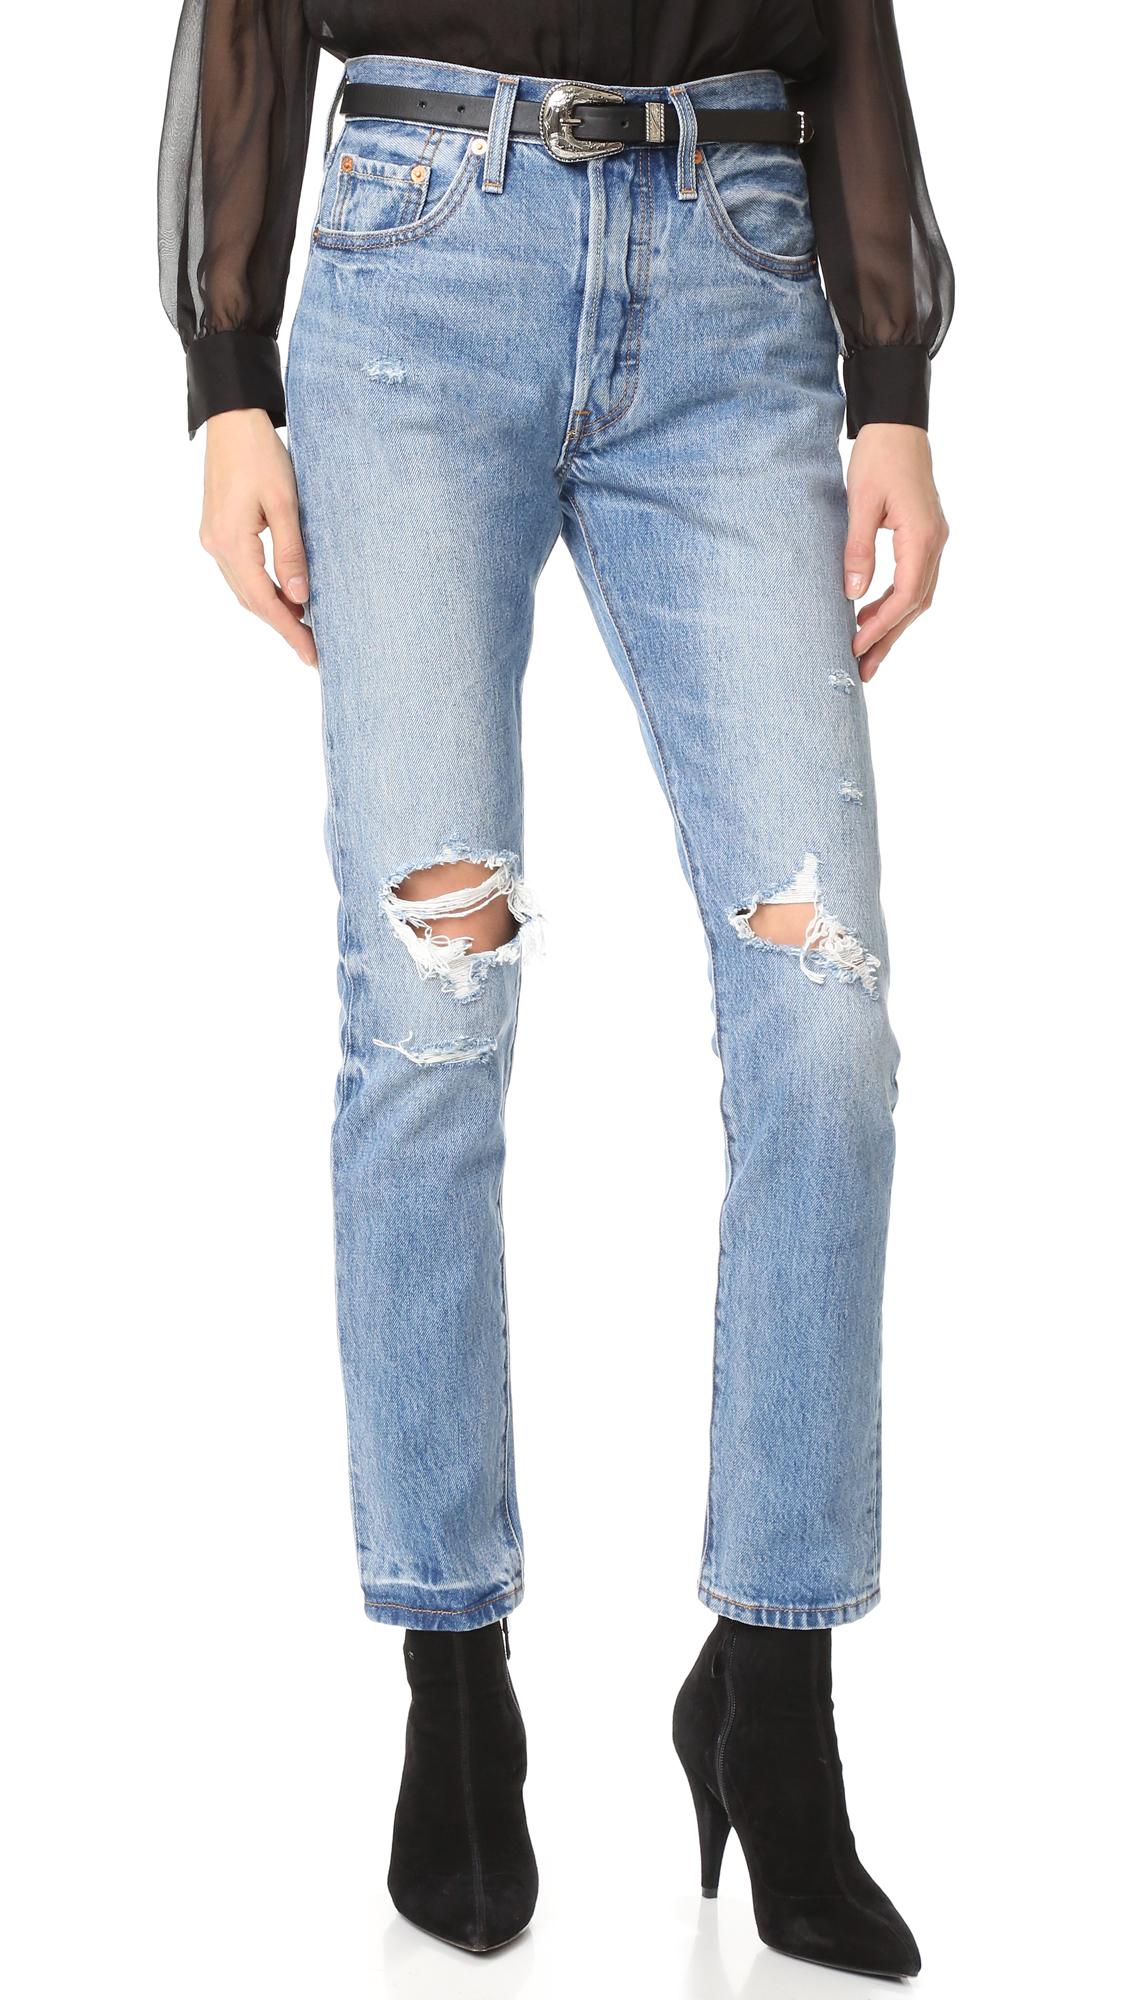 levi's, 501 skinny, distressed jeans, mom jeans, skinny straight